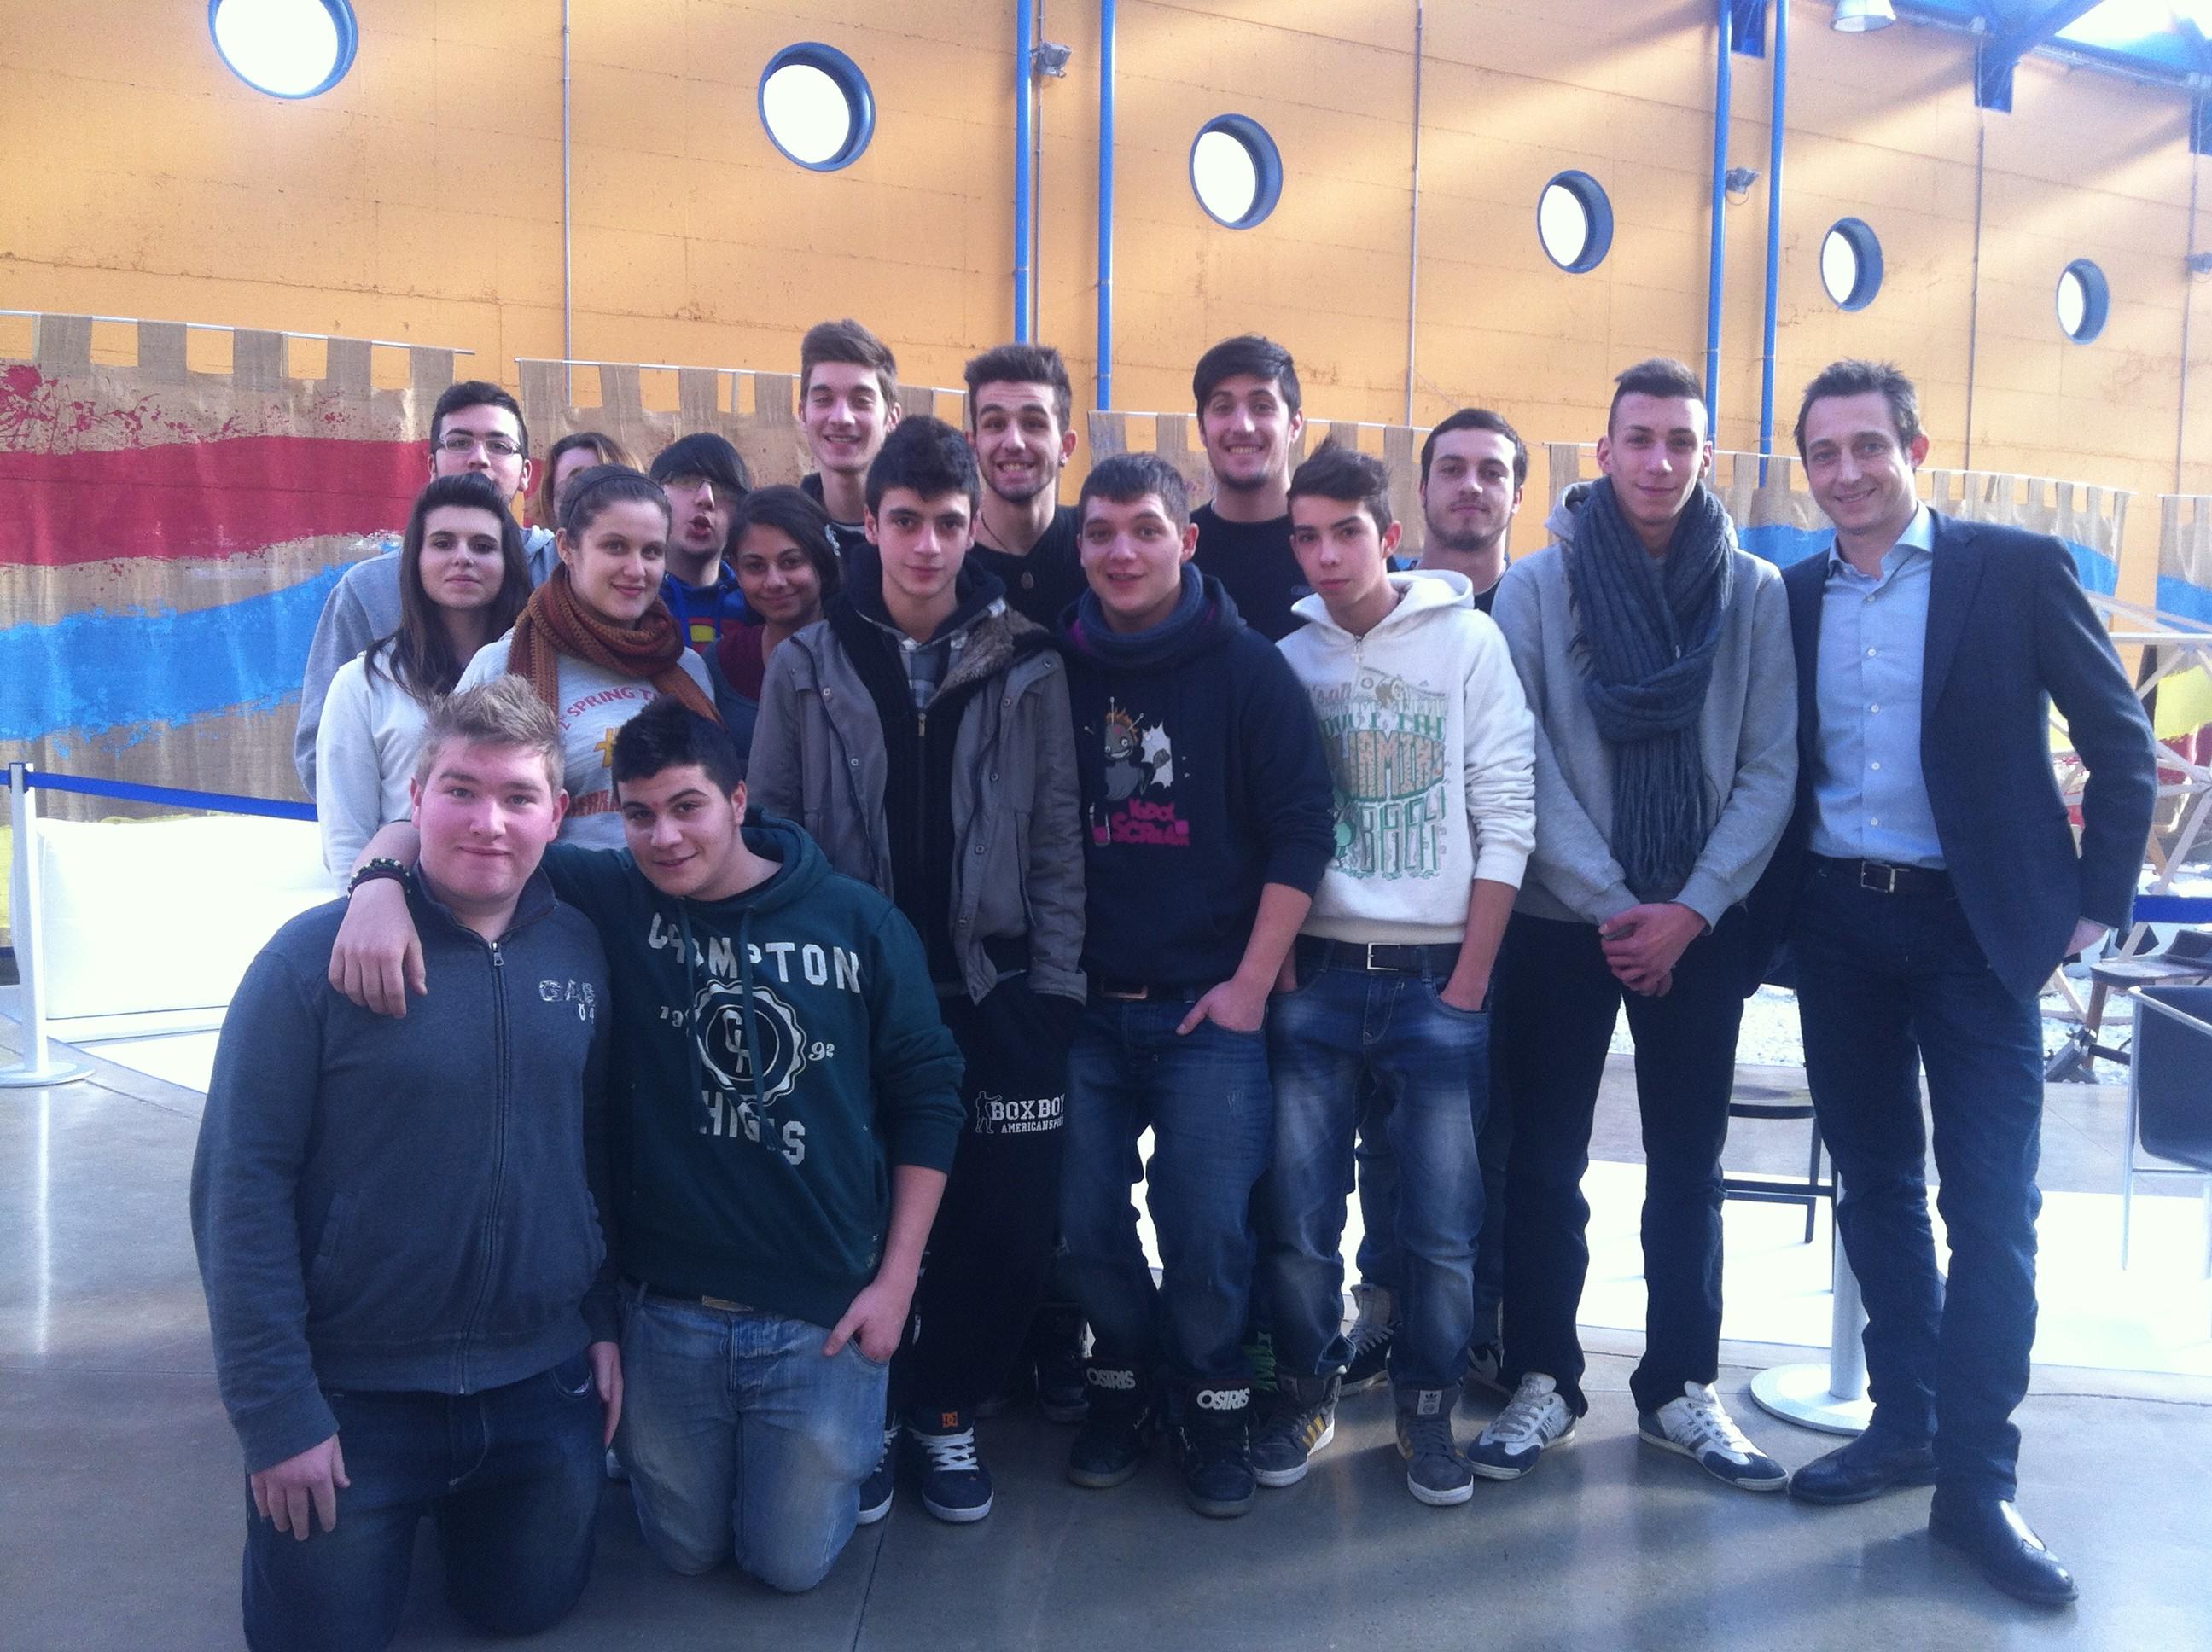 https://blog.bertosalotti.ru/wp-content/uploads/2013/01/scuola-tappezzieri-e1358754242904.jpg